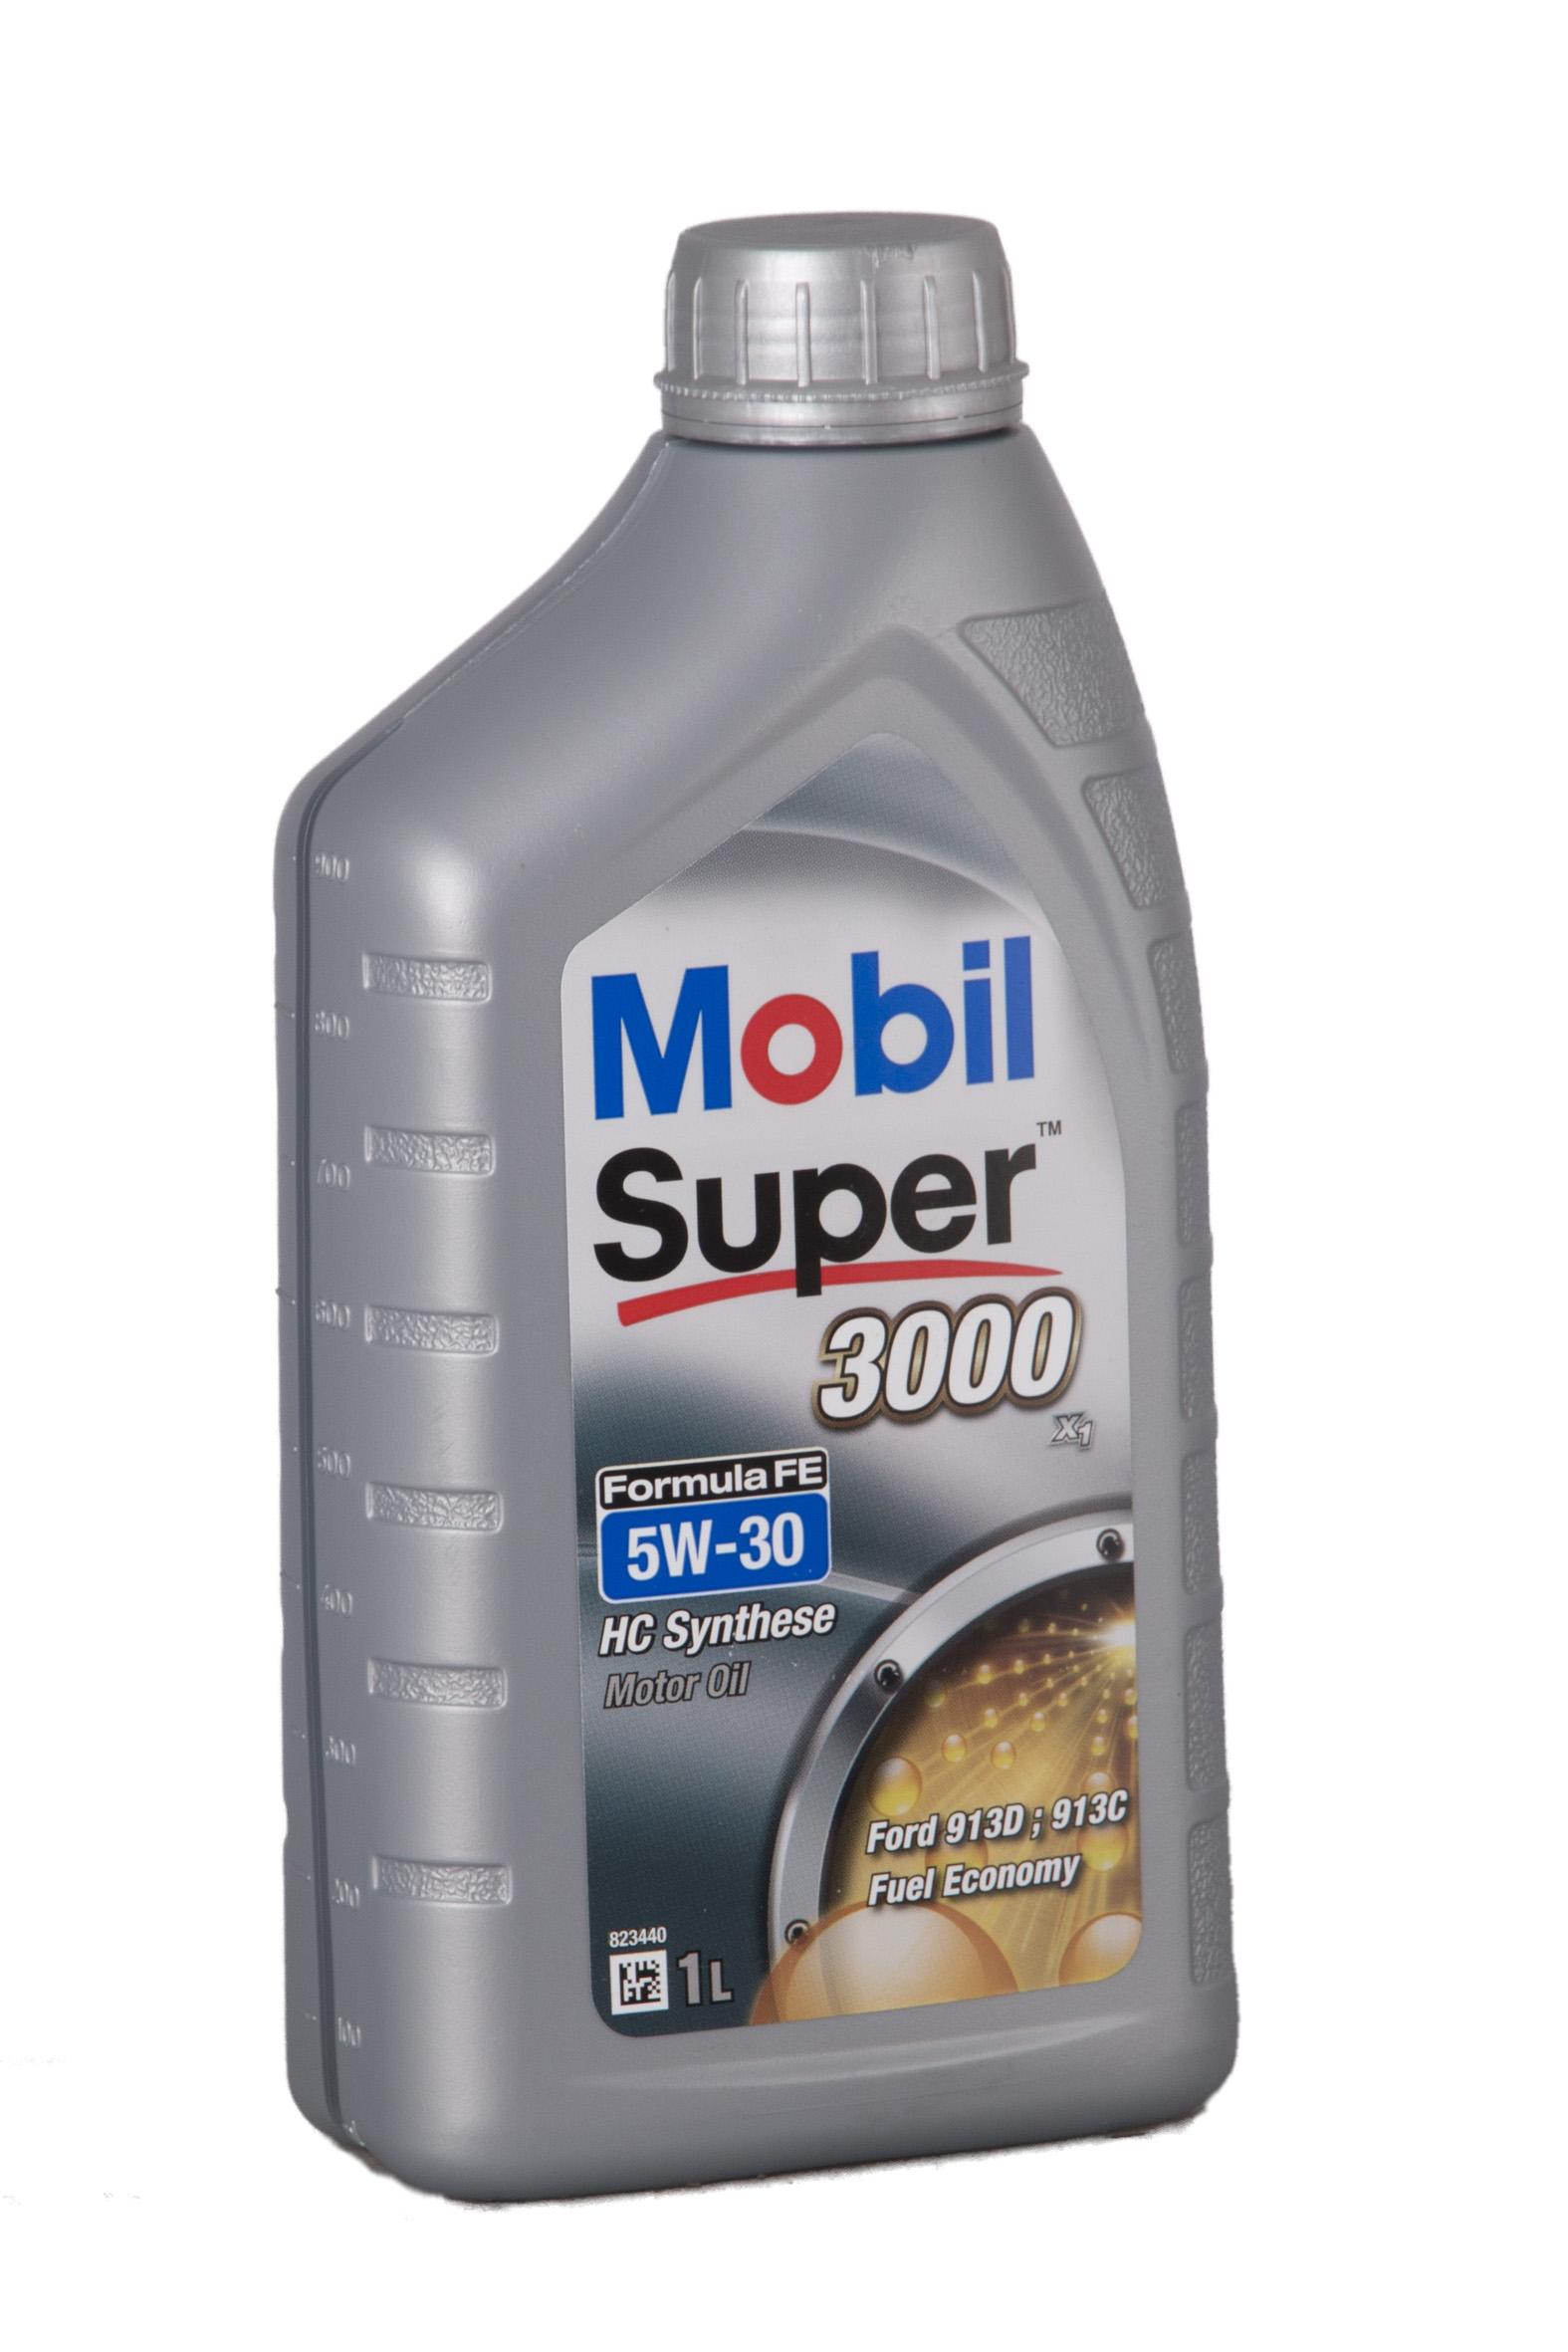 Mobil Super 3000 X1 Formula FE 5W-30 1 Liter – Bild 1